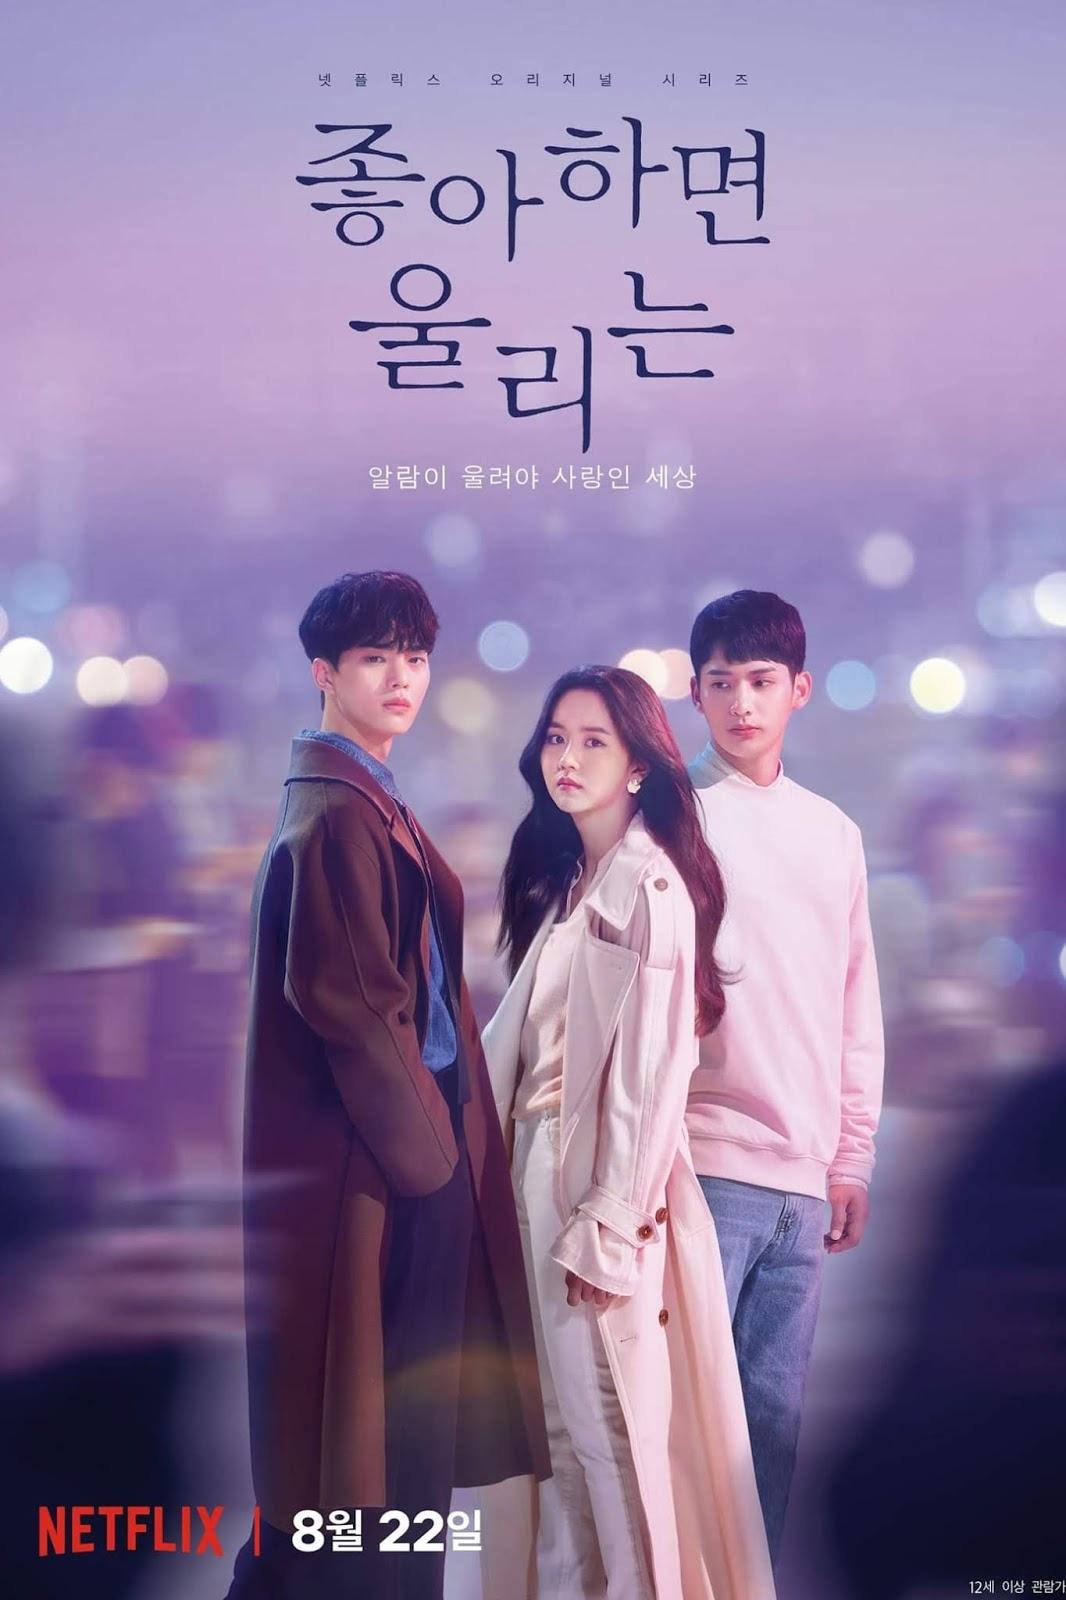 Aku Seorang Muslim dan Menonton Drama Korea dengan Gembira